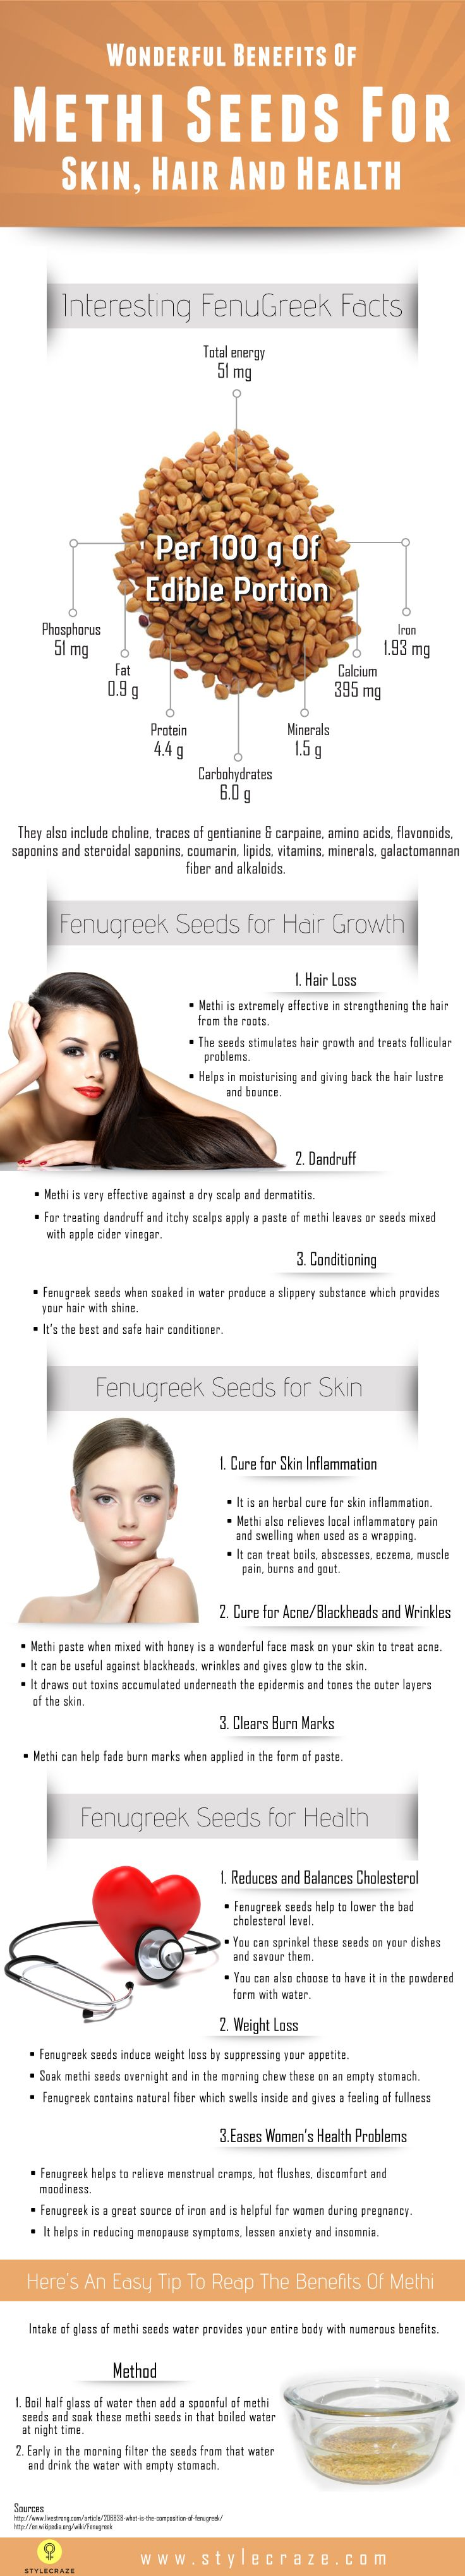 الحلبة Fenugreek or methi seeds offer many beneficial properties. Know how fenugreek seeds for hair growth help & also its benefits for skin & health.